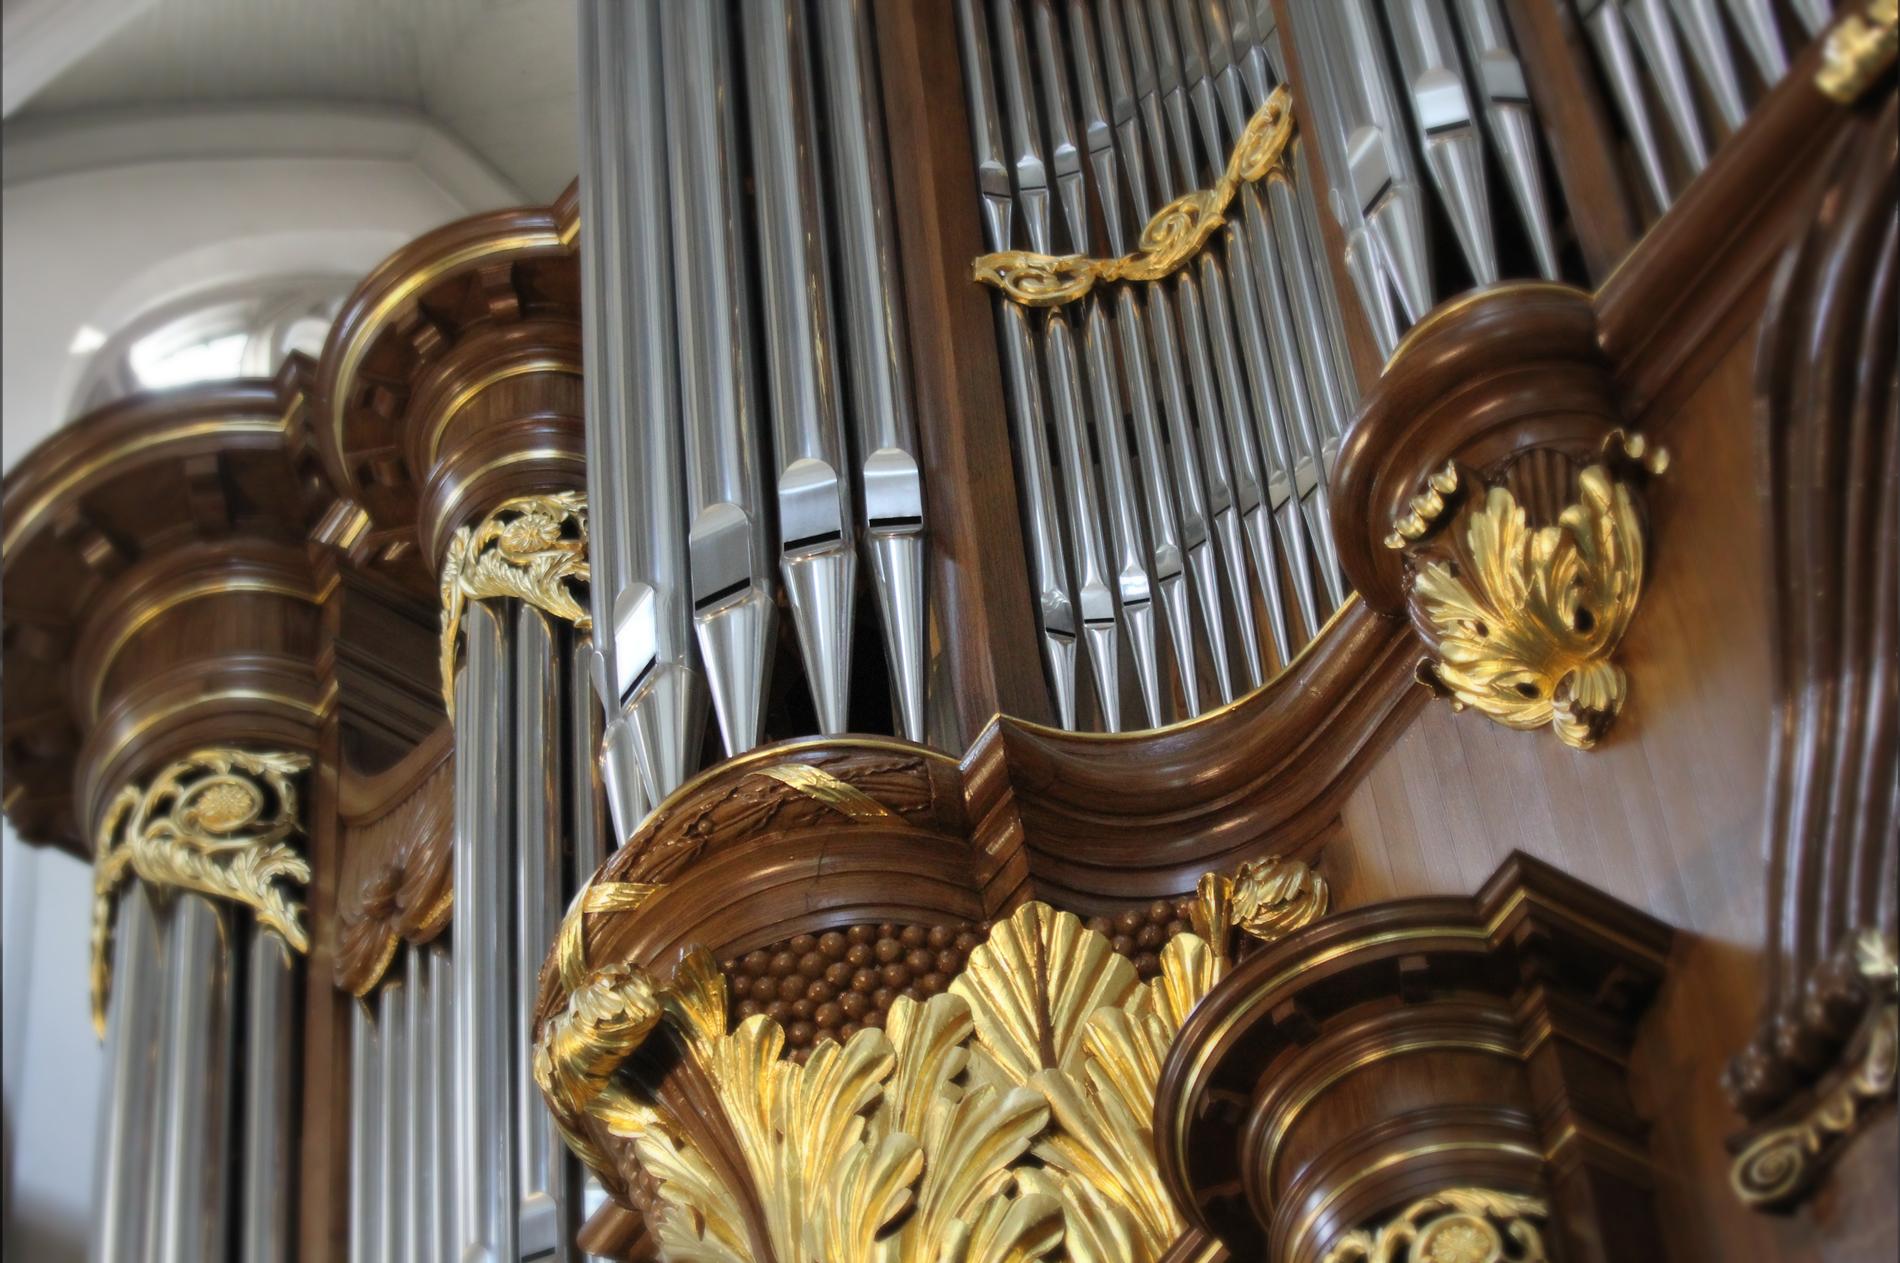 CD-presentatie met orgelwerken van Carl Philipp Emanuel Bach